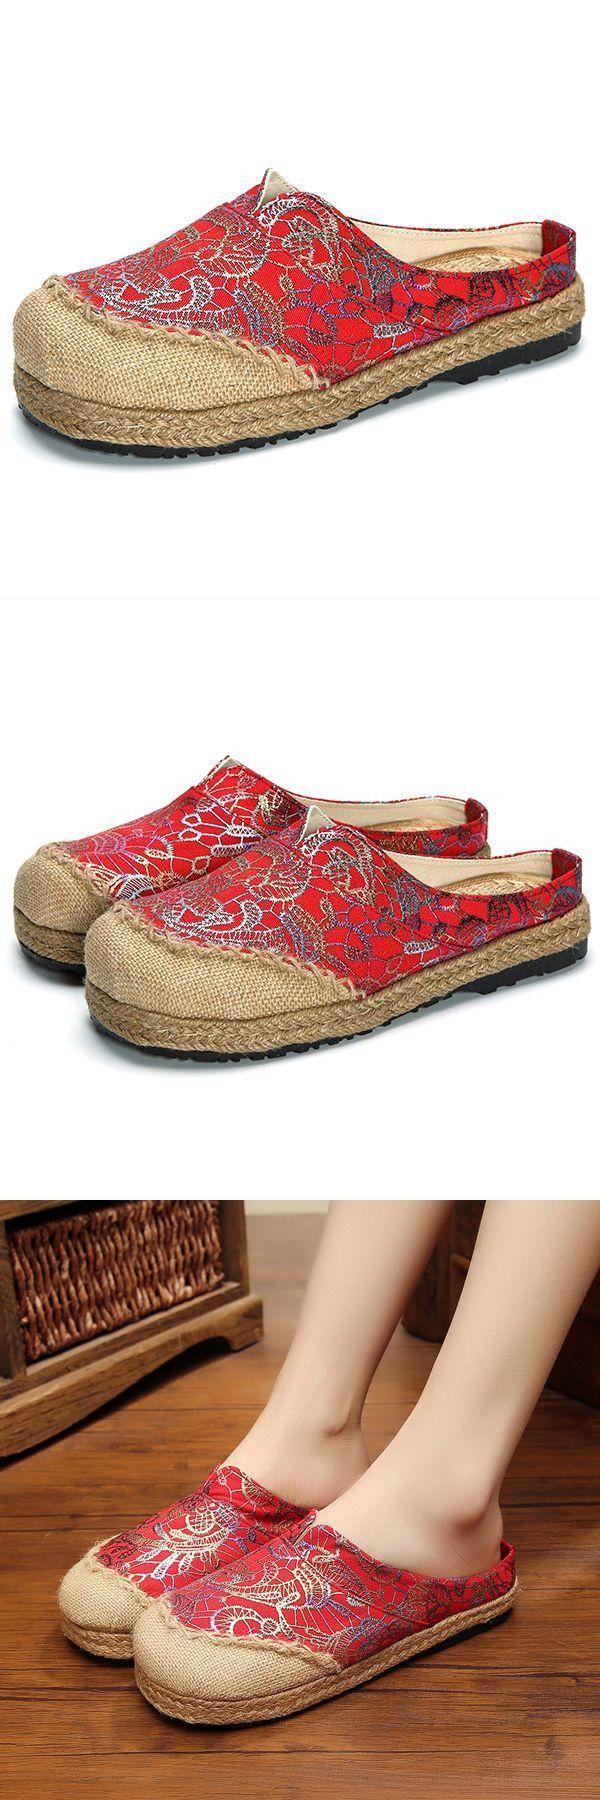 Women slip on flax cloth shoes casual flat loafers flat navy loafers #flat #navy #shoe #flat #shoe #clearance #flat #shoe #pattern